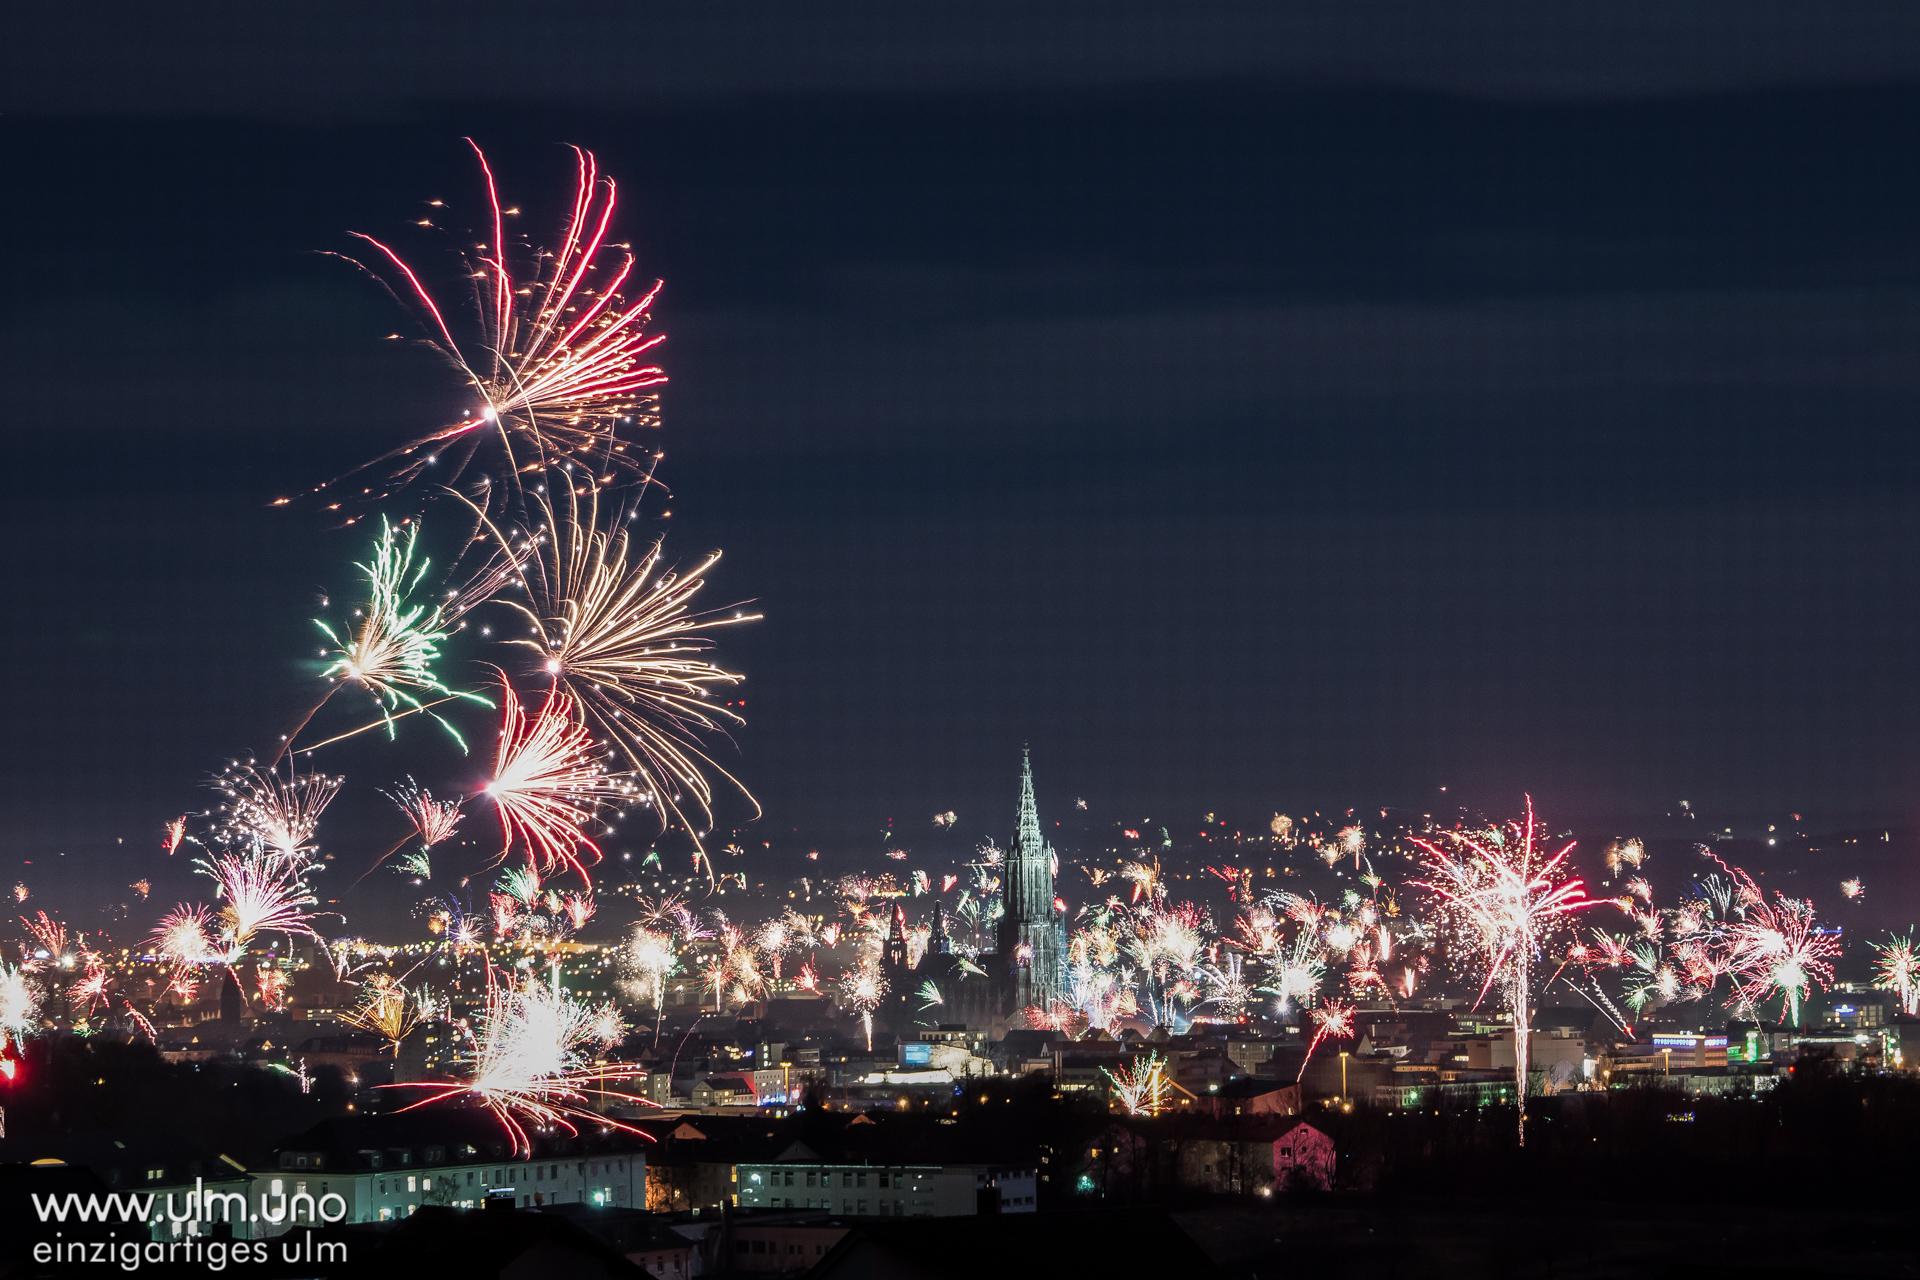 Silvester Feuerwerk Ulm - Jahreswechsel 2017/2018 - www